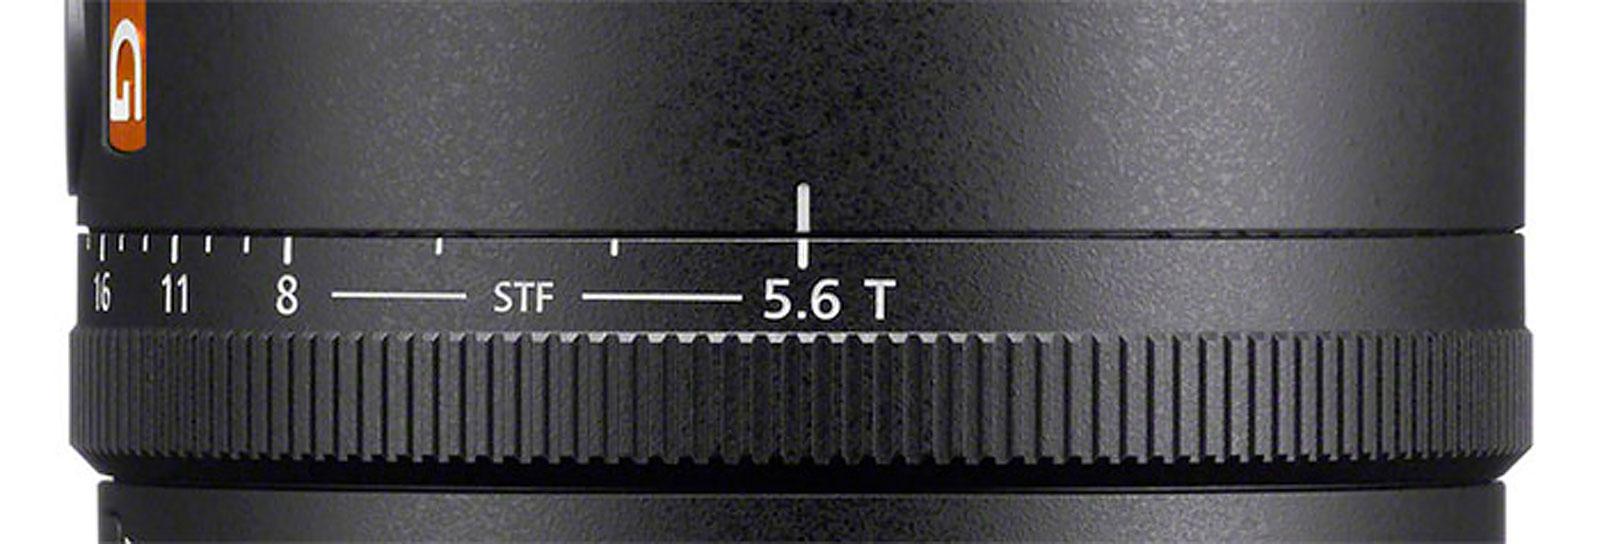 Sony FE 100mm F2.8 STF GM OSS T-Stops